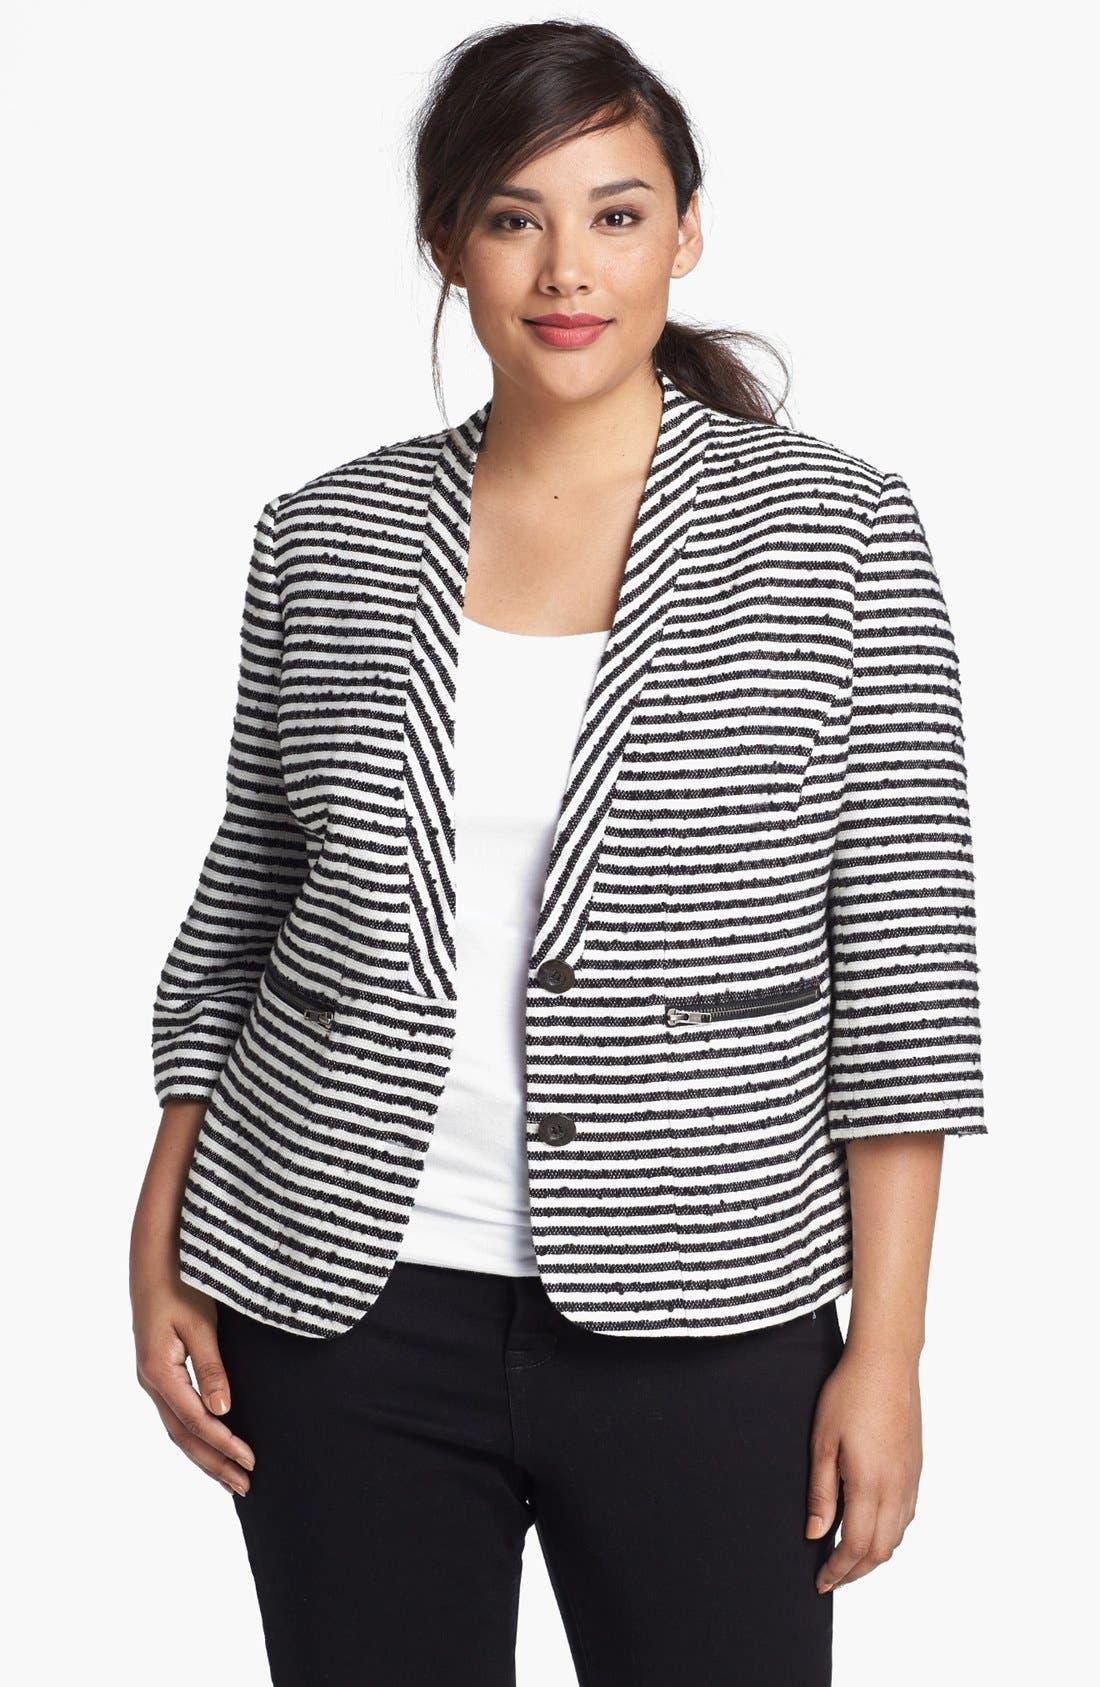 Alternate Image 1 Selected - Sejour 'Barre' Tweed Jacket (Plus Size)